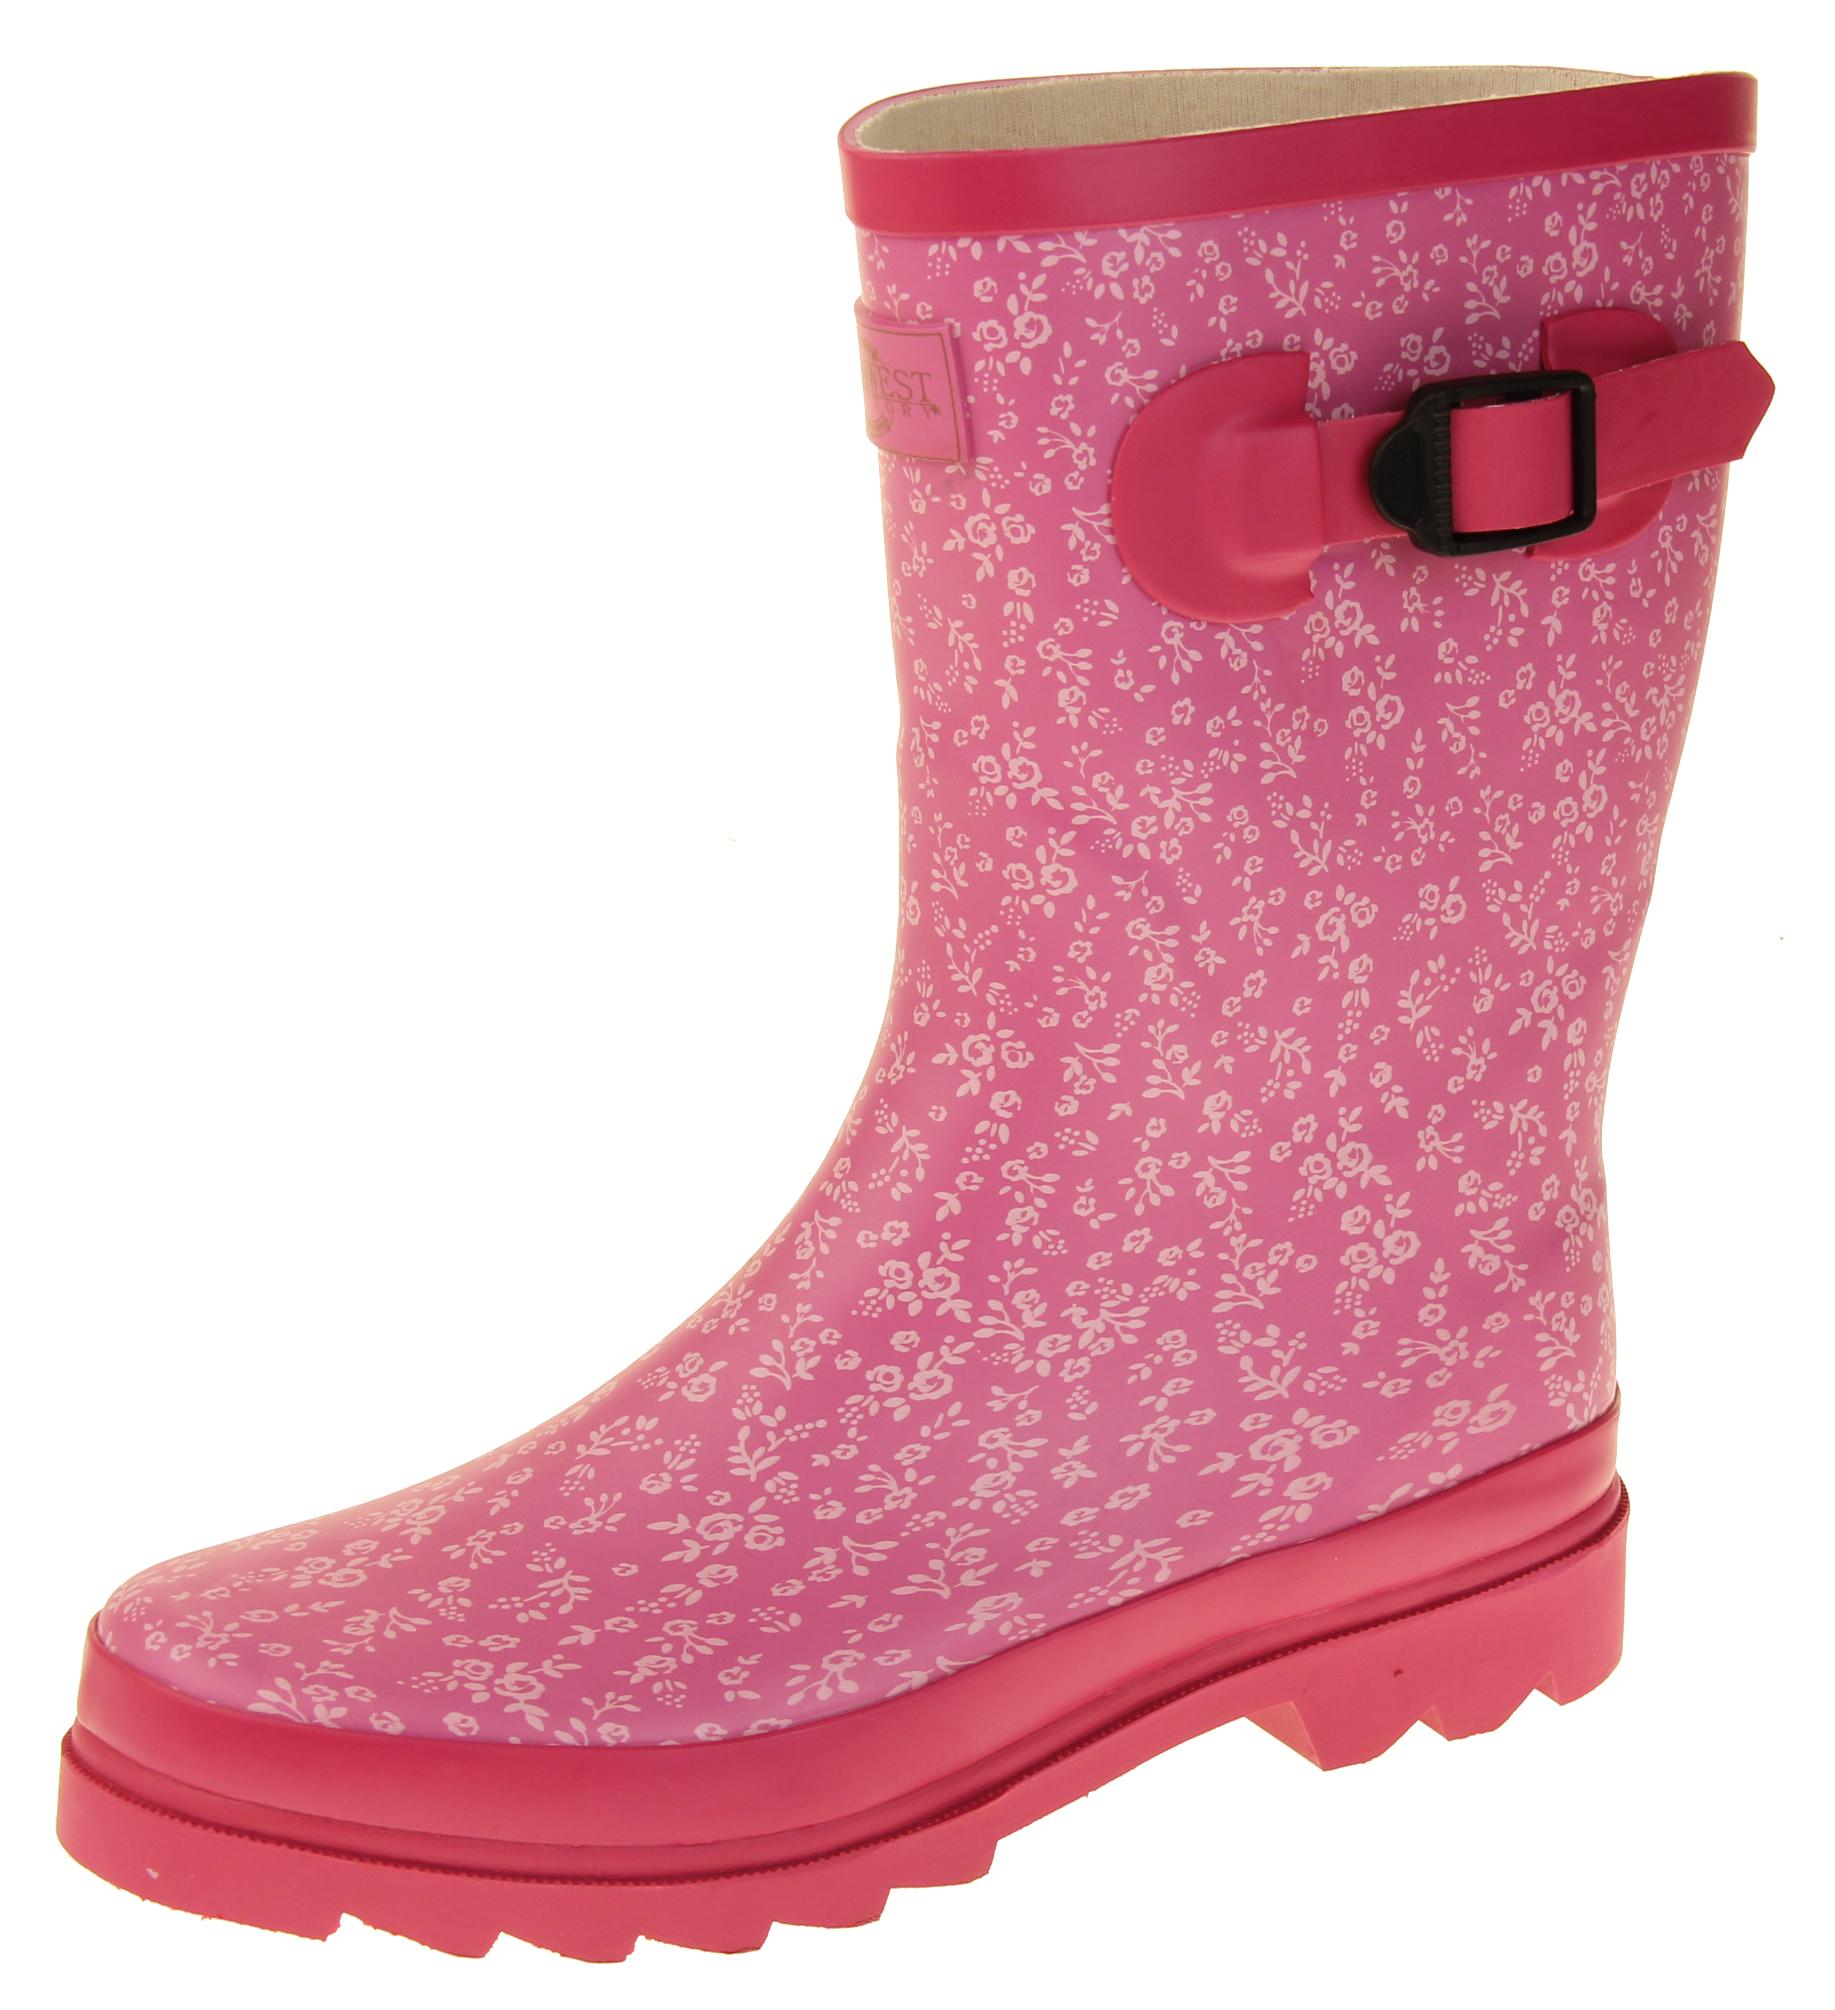 b662a5ab6c3 Womens Floral Calf Length Rubber Festival Wellington Boots